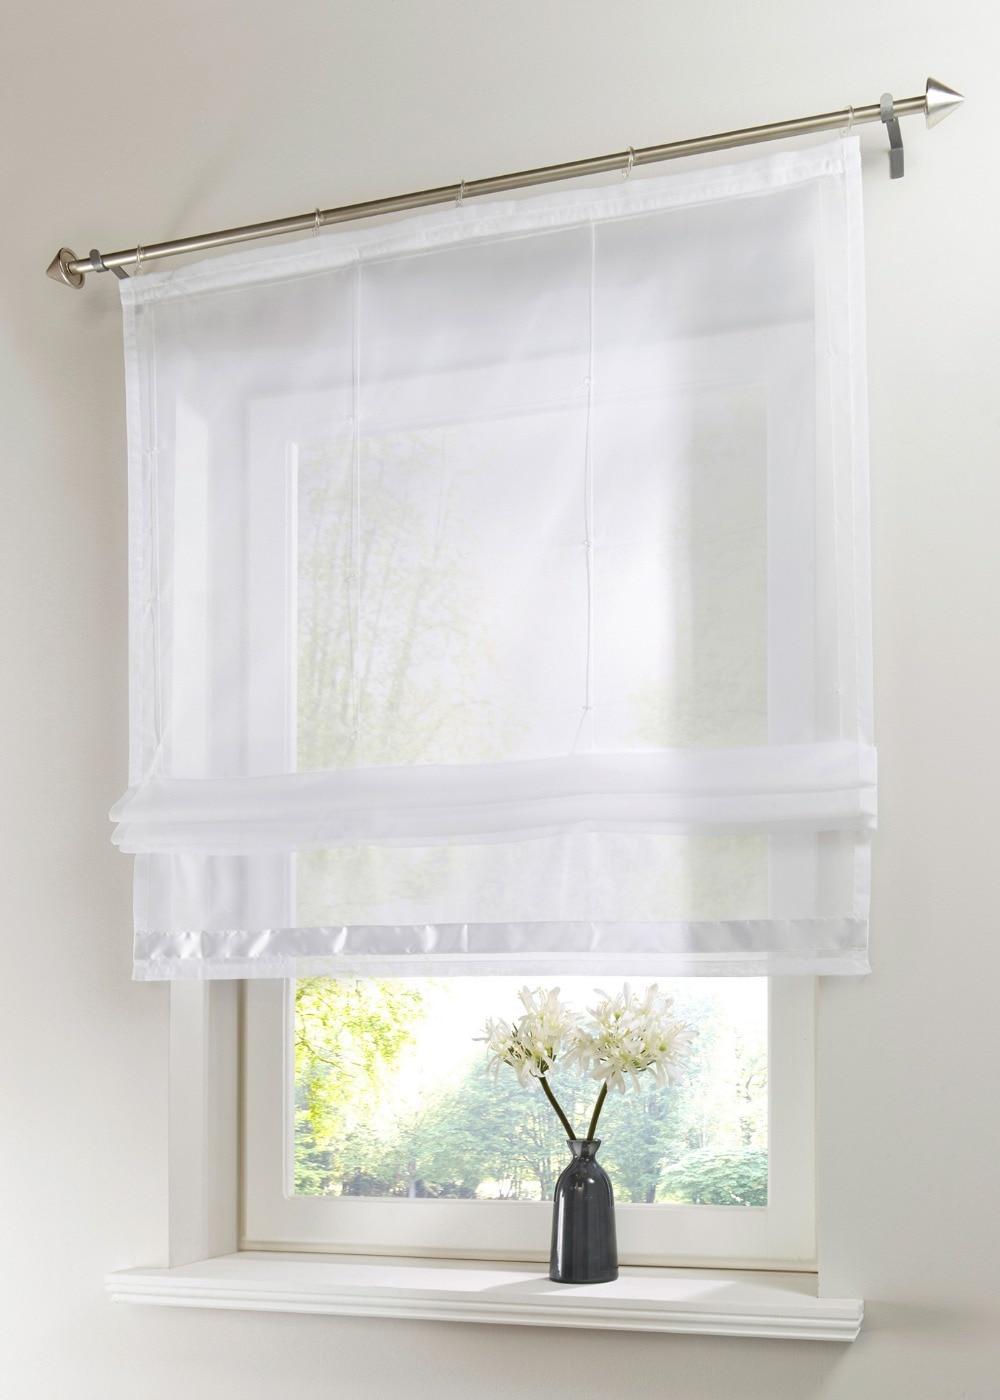 blackout ikea roller sheer shades matchstick blind window curtains white wonderful roman navy blinds